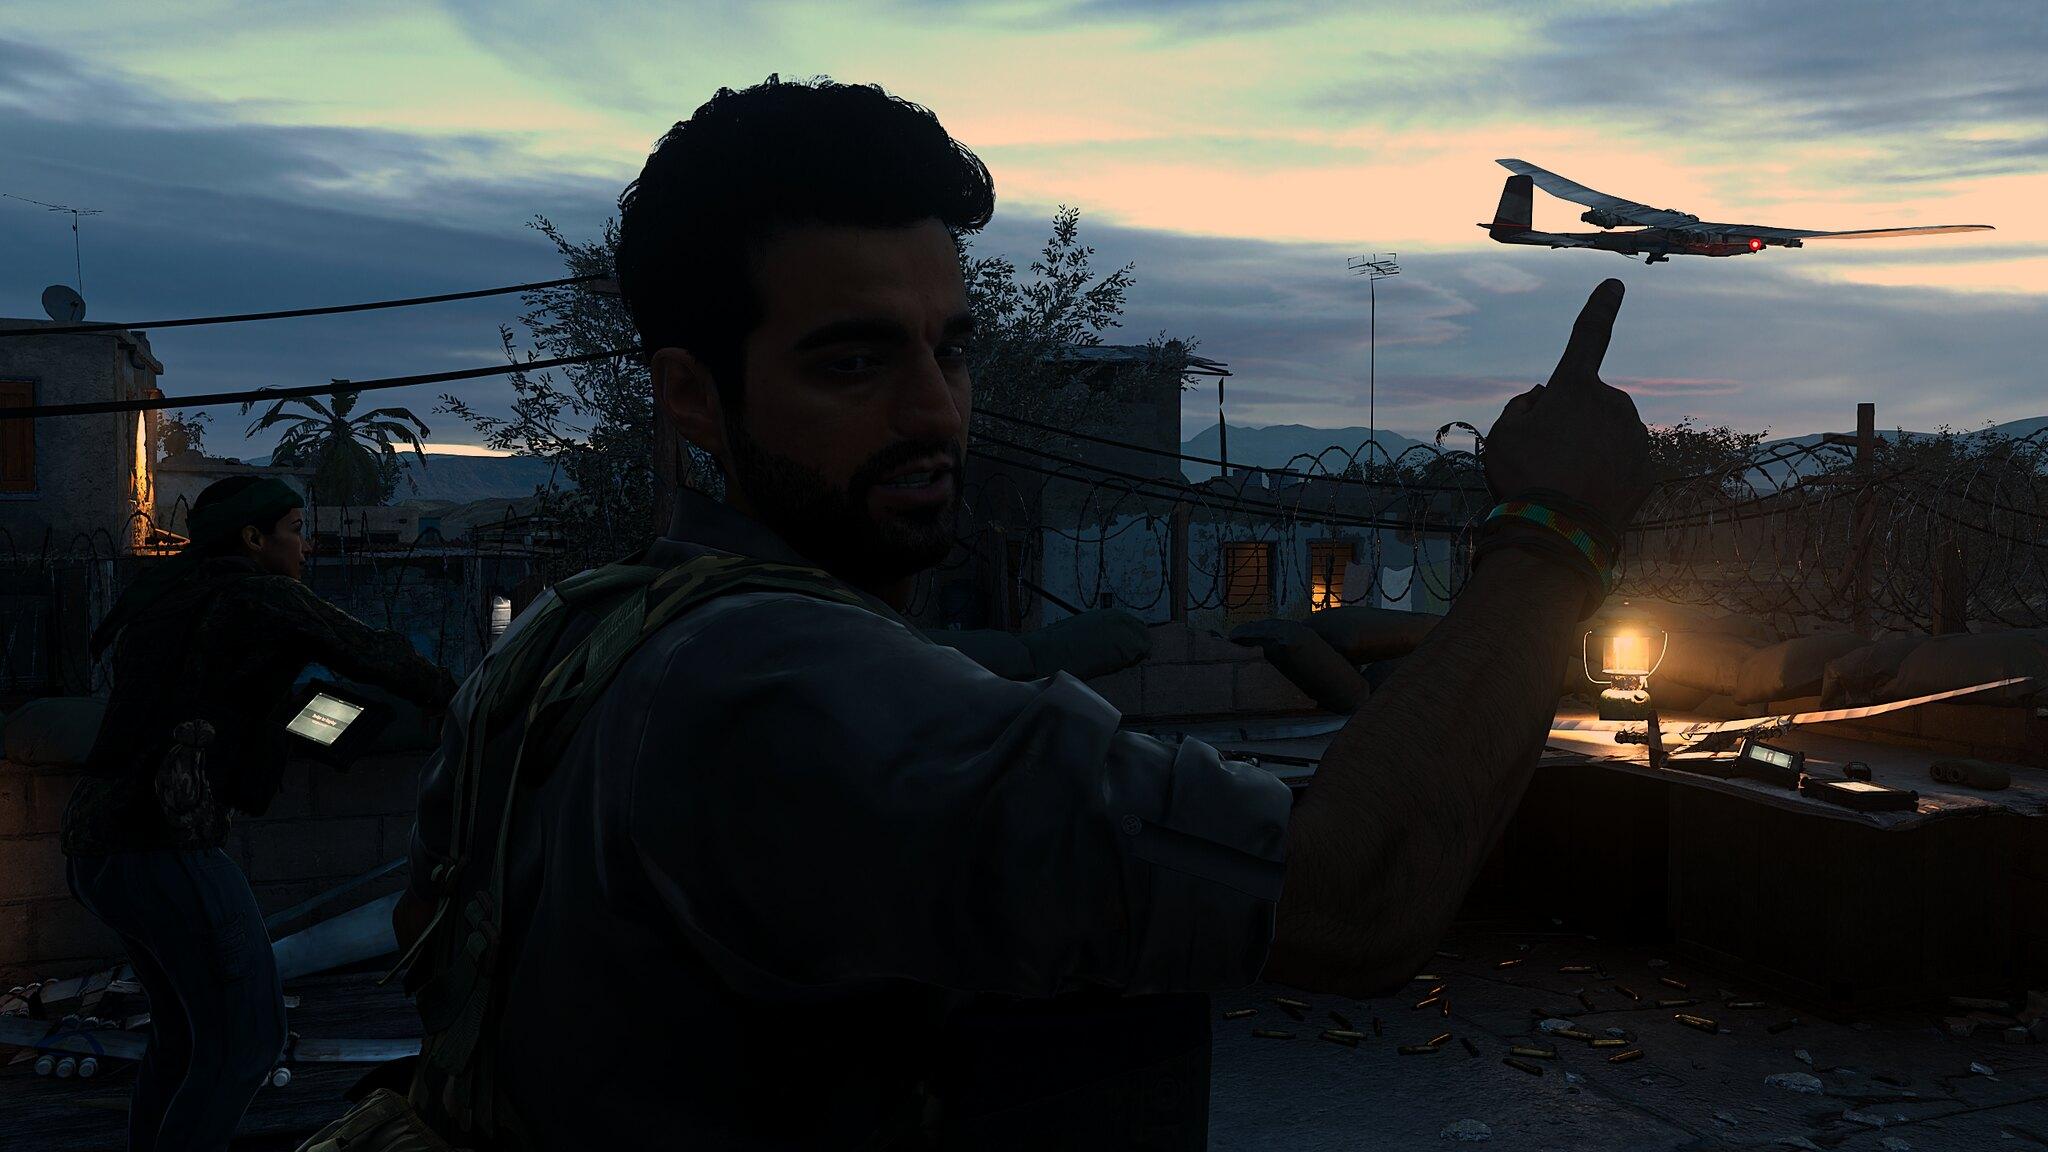 48960320787_8087b17ca6_k.jpg - Call of Duty: Modern Warfare (2019)